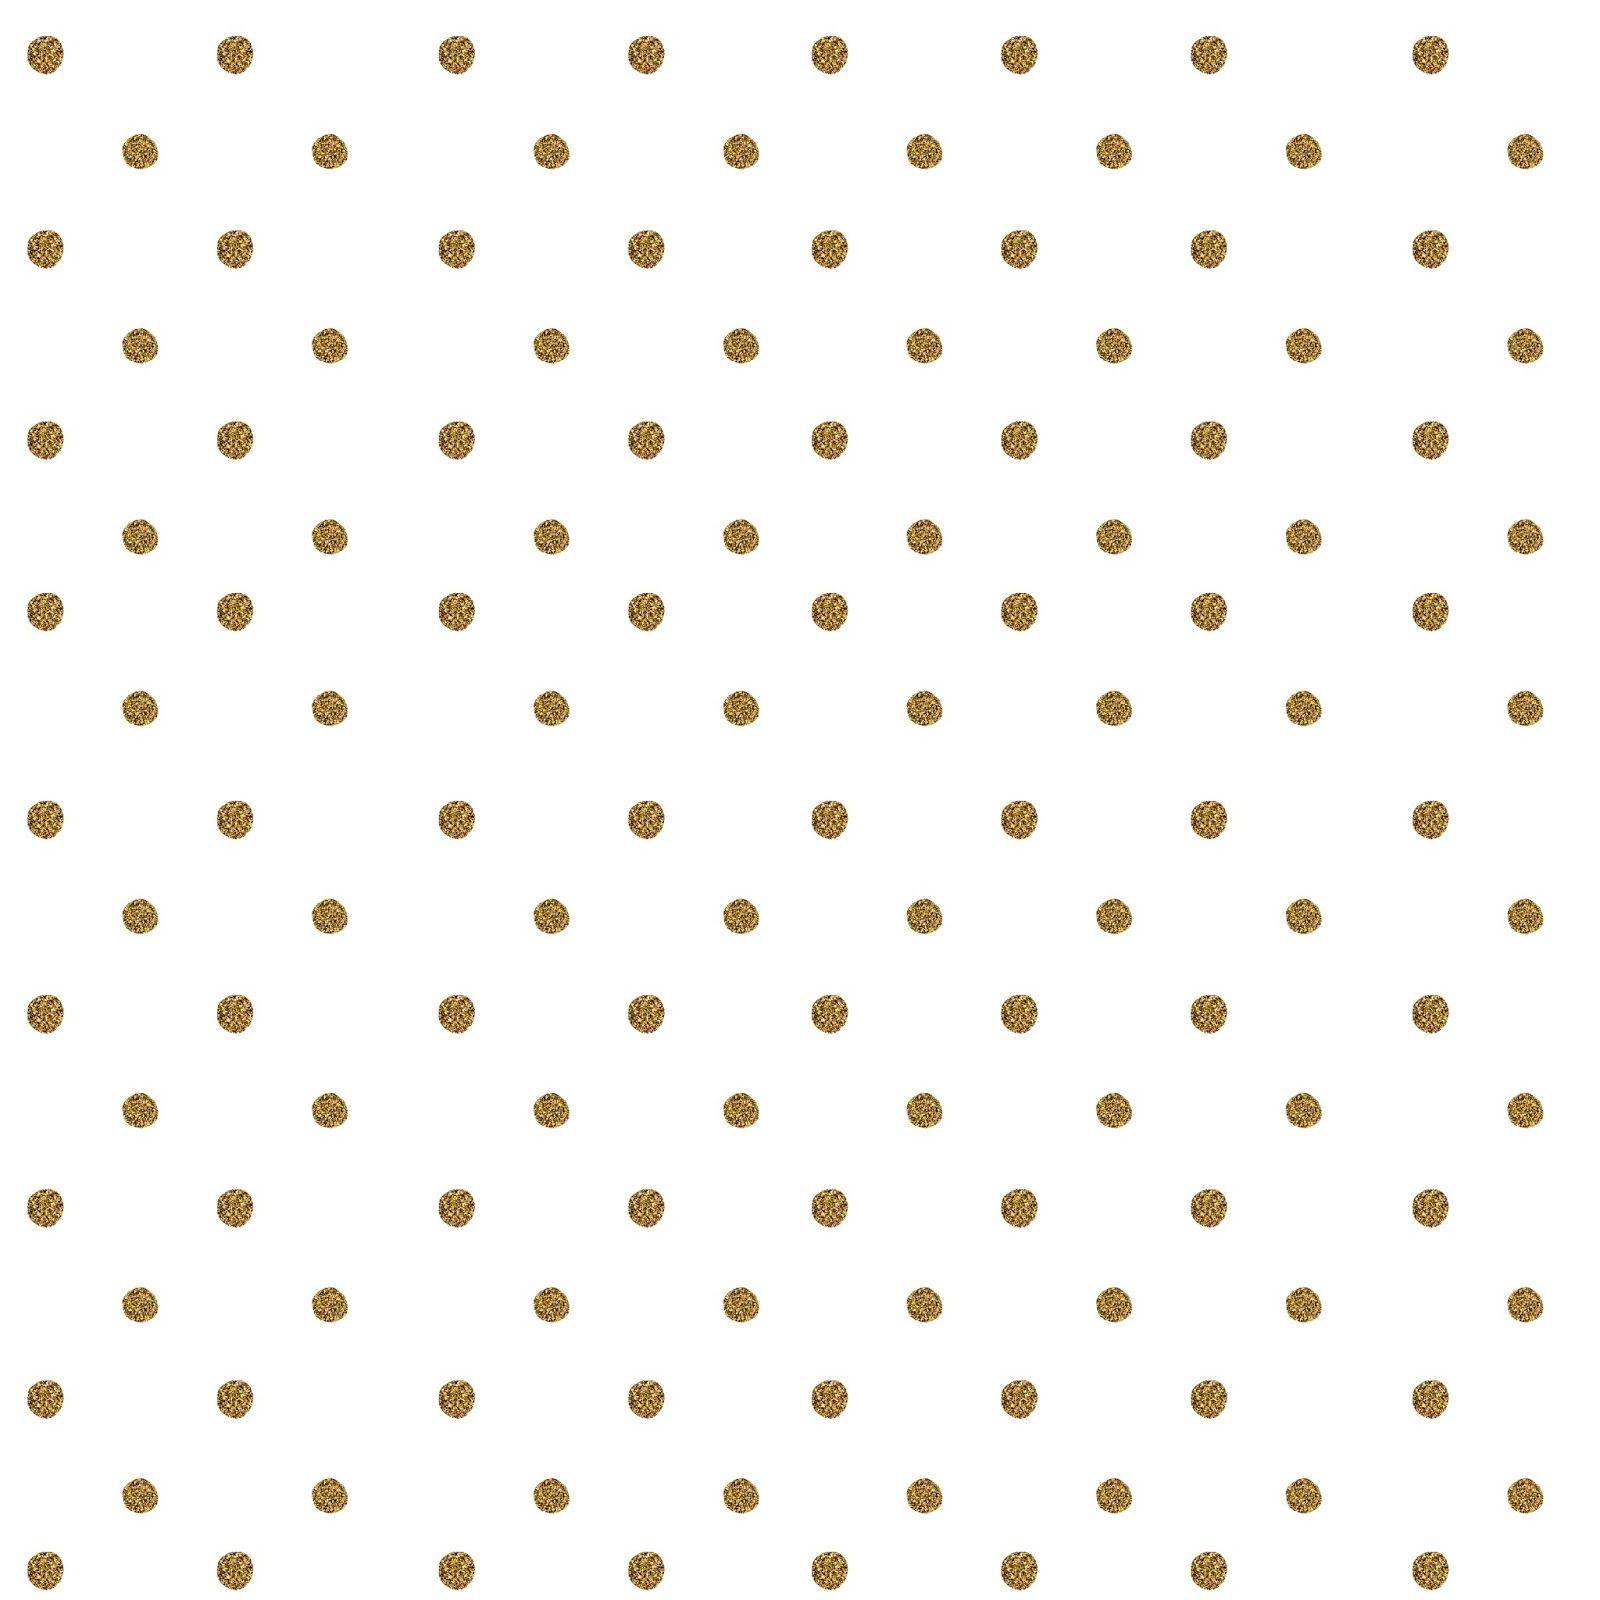 Free Vectors Free Girly Gold Glitter Backgrounds Art Design